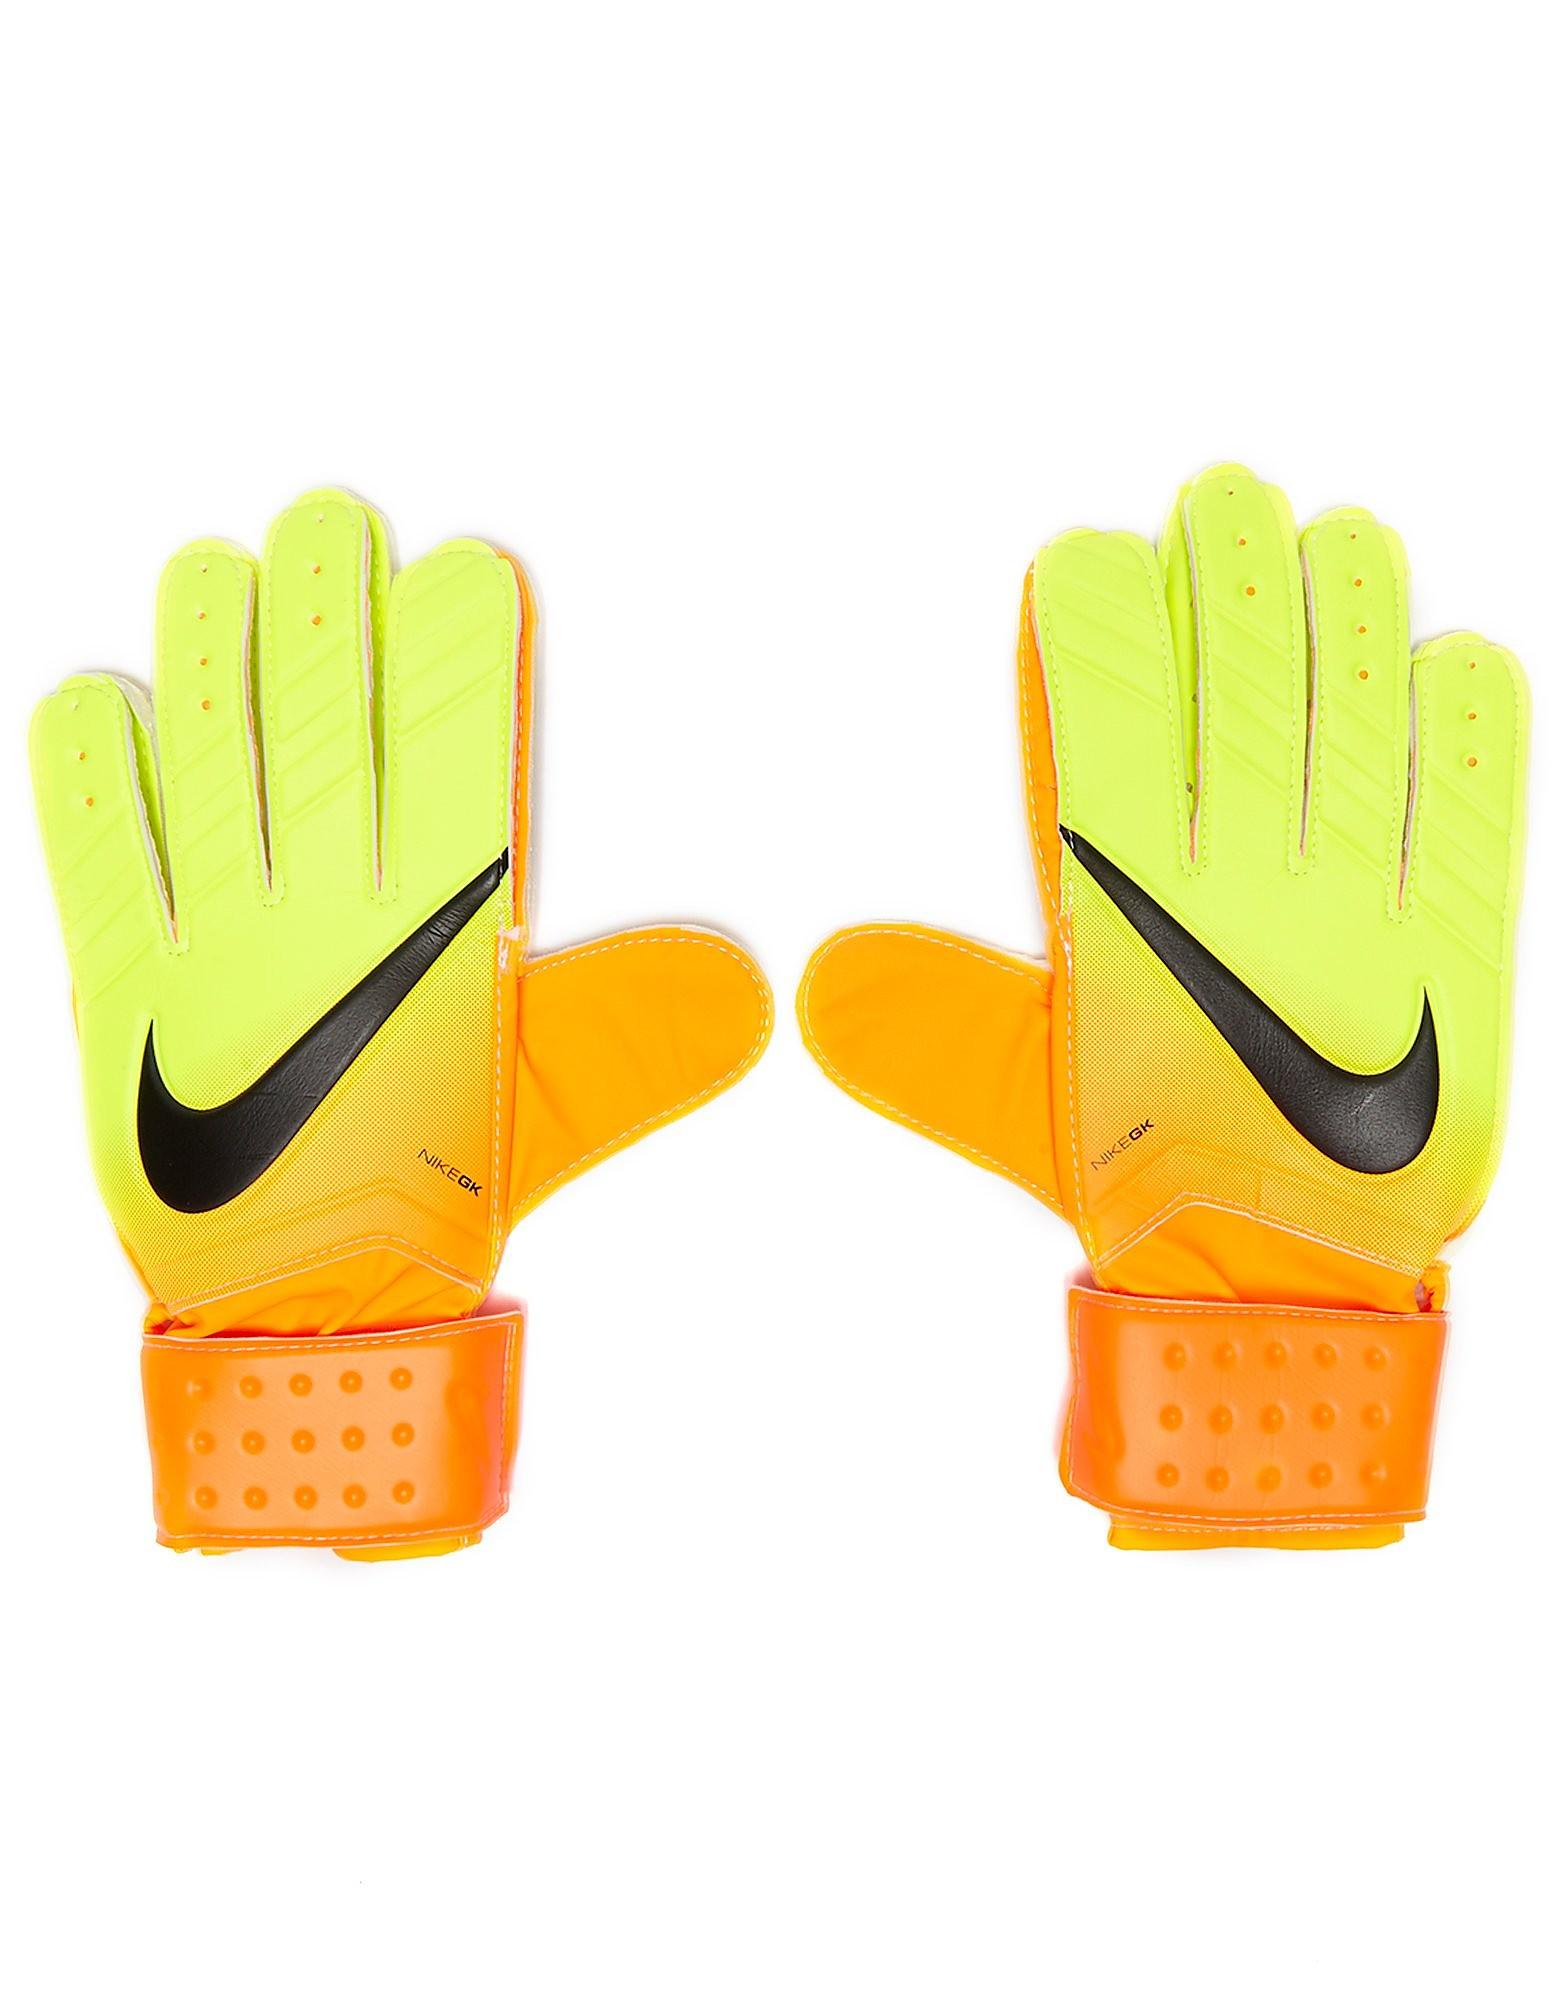 Leather gloves mens jd - Nike Gk Matchhandschoenen Bright Citrus Mens Bright Citrus